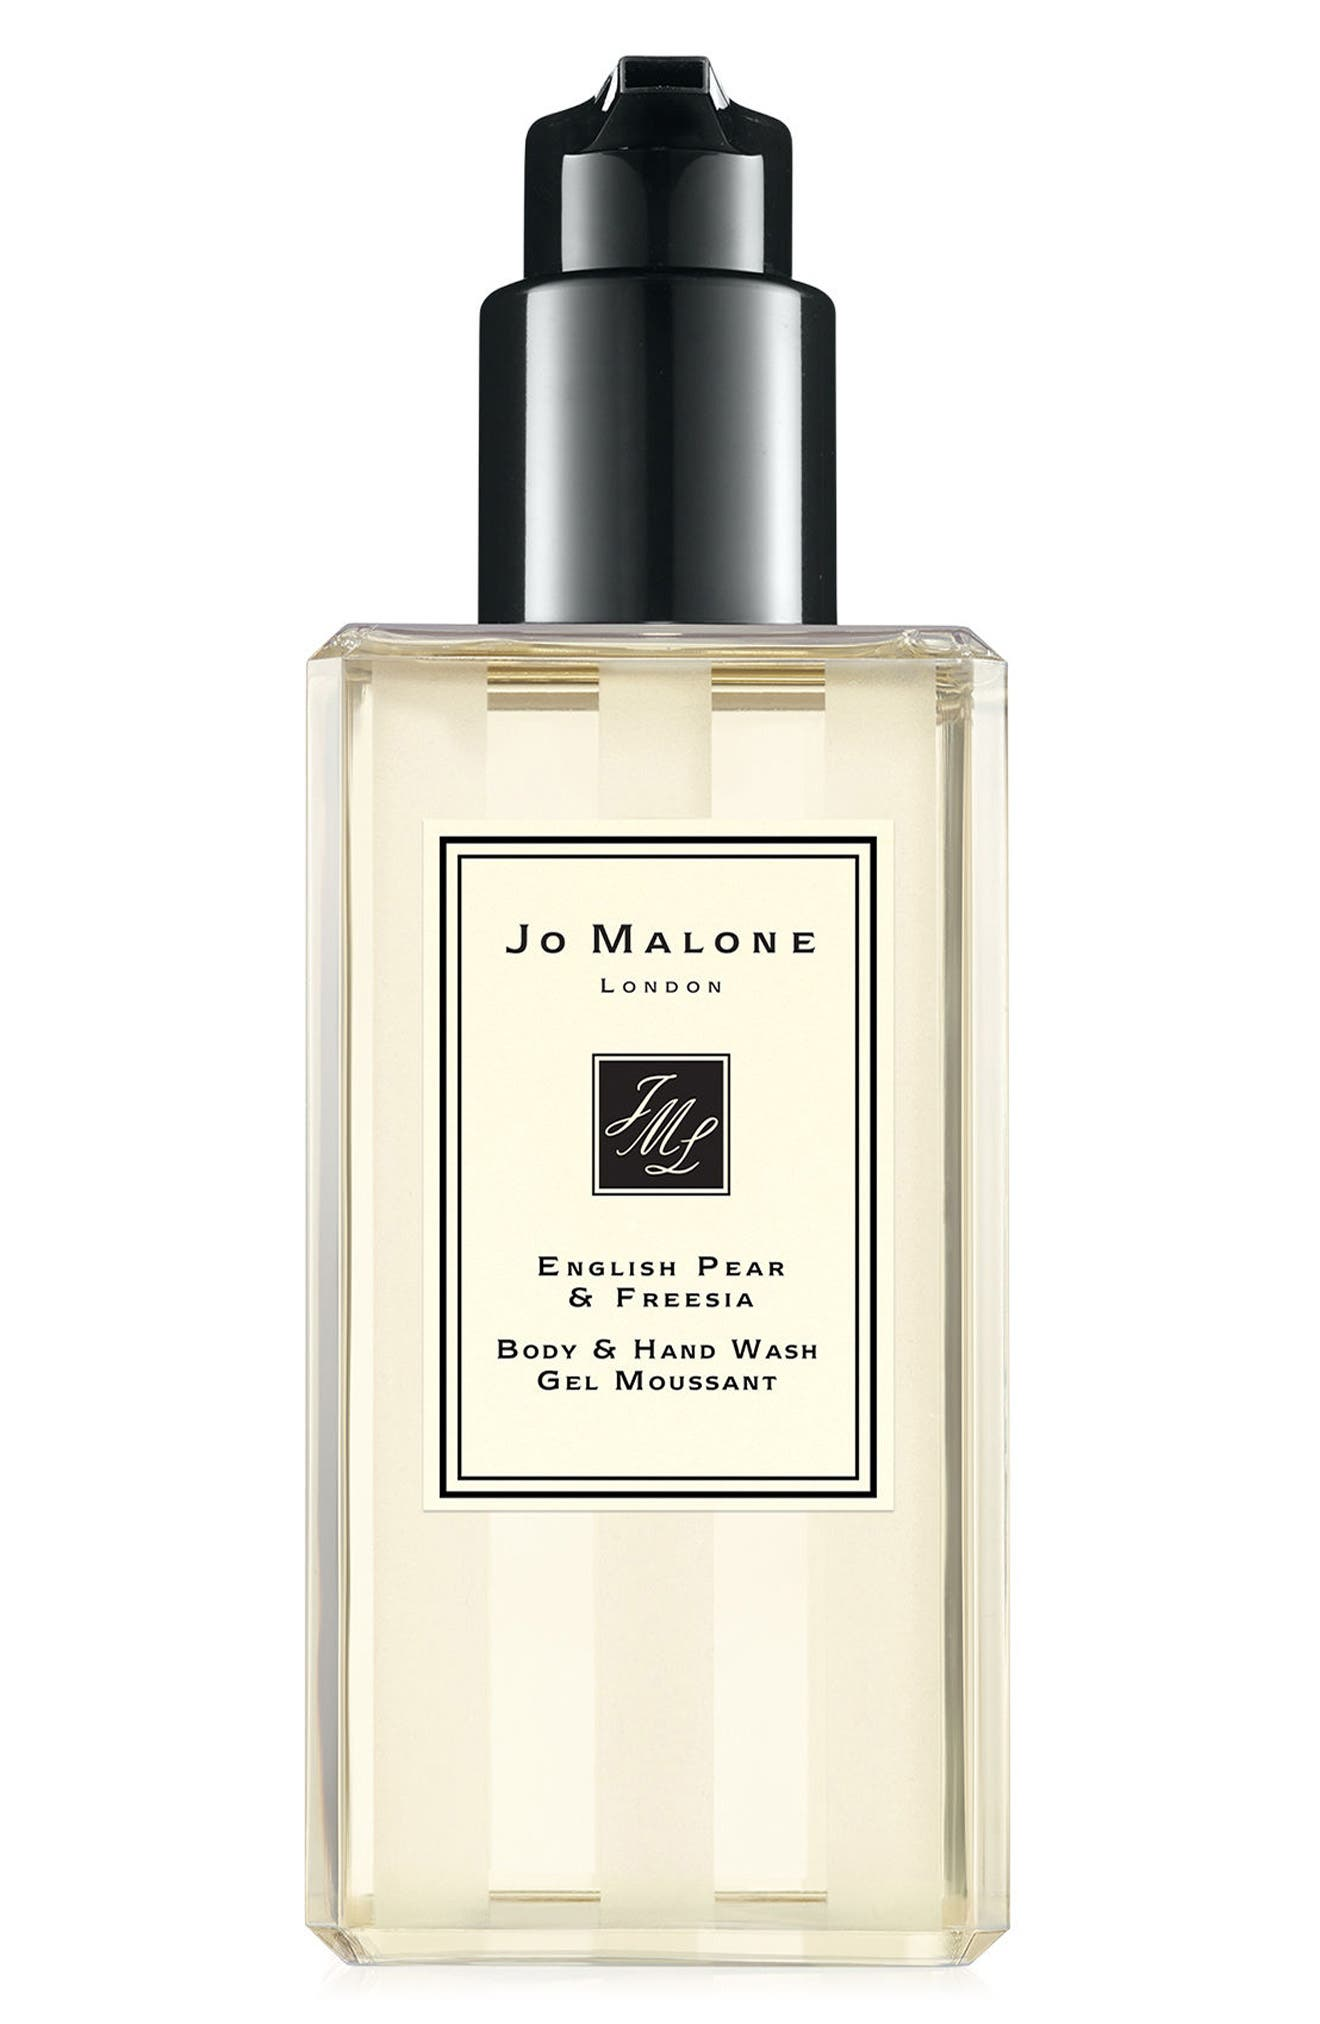 Jo Malone London™ 'English Pear & Freesia' Body & Hand Wash